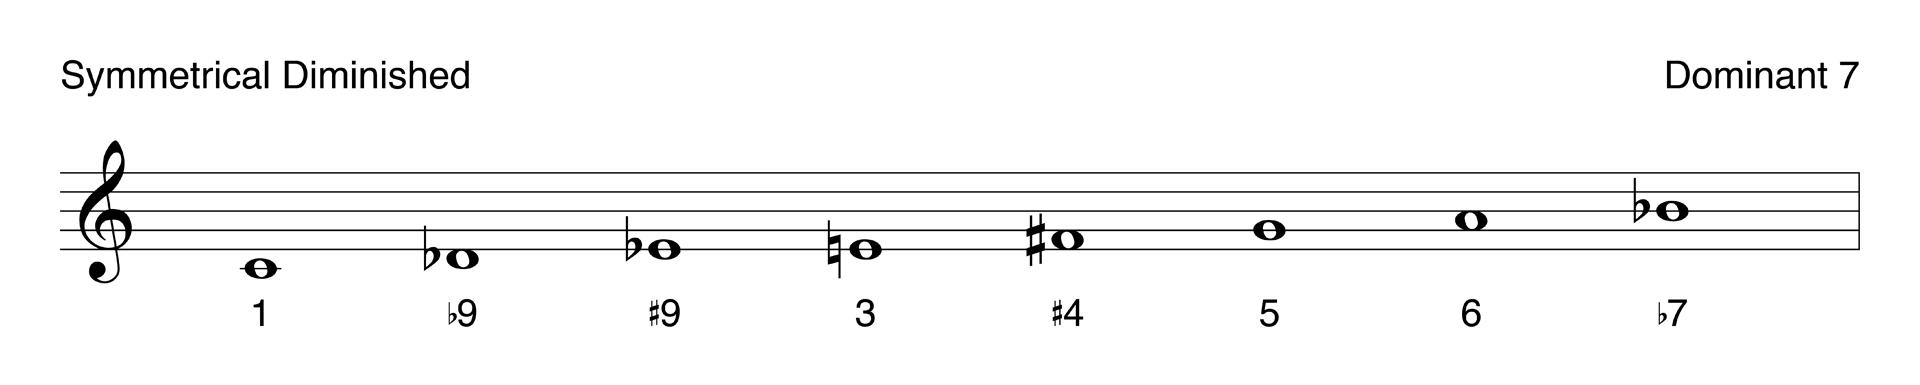 The symmetrical diminished scale as it relates to jazz improvisation.